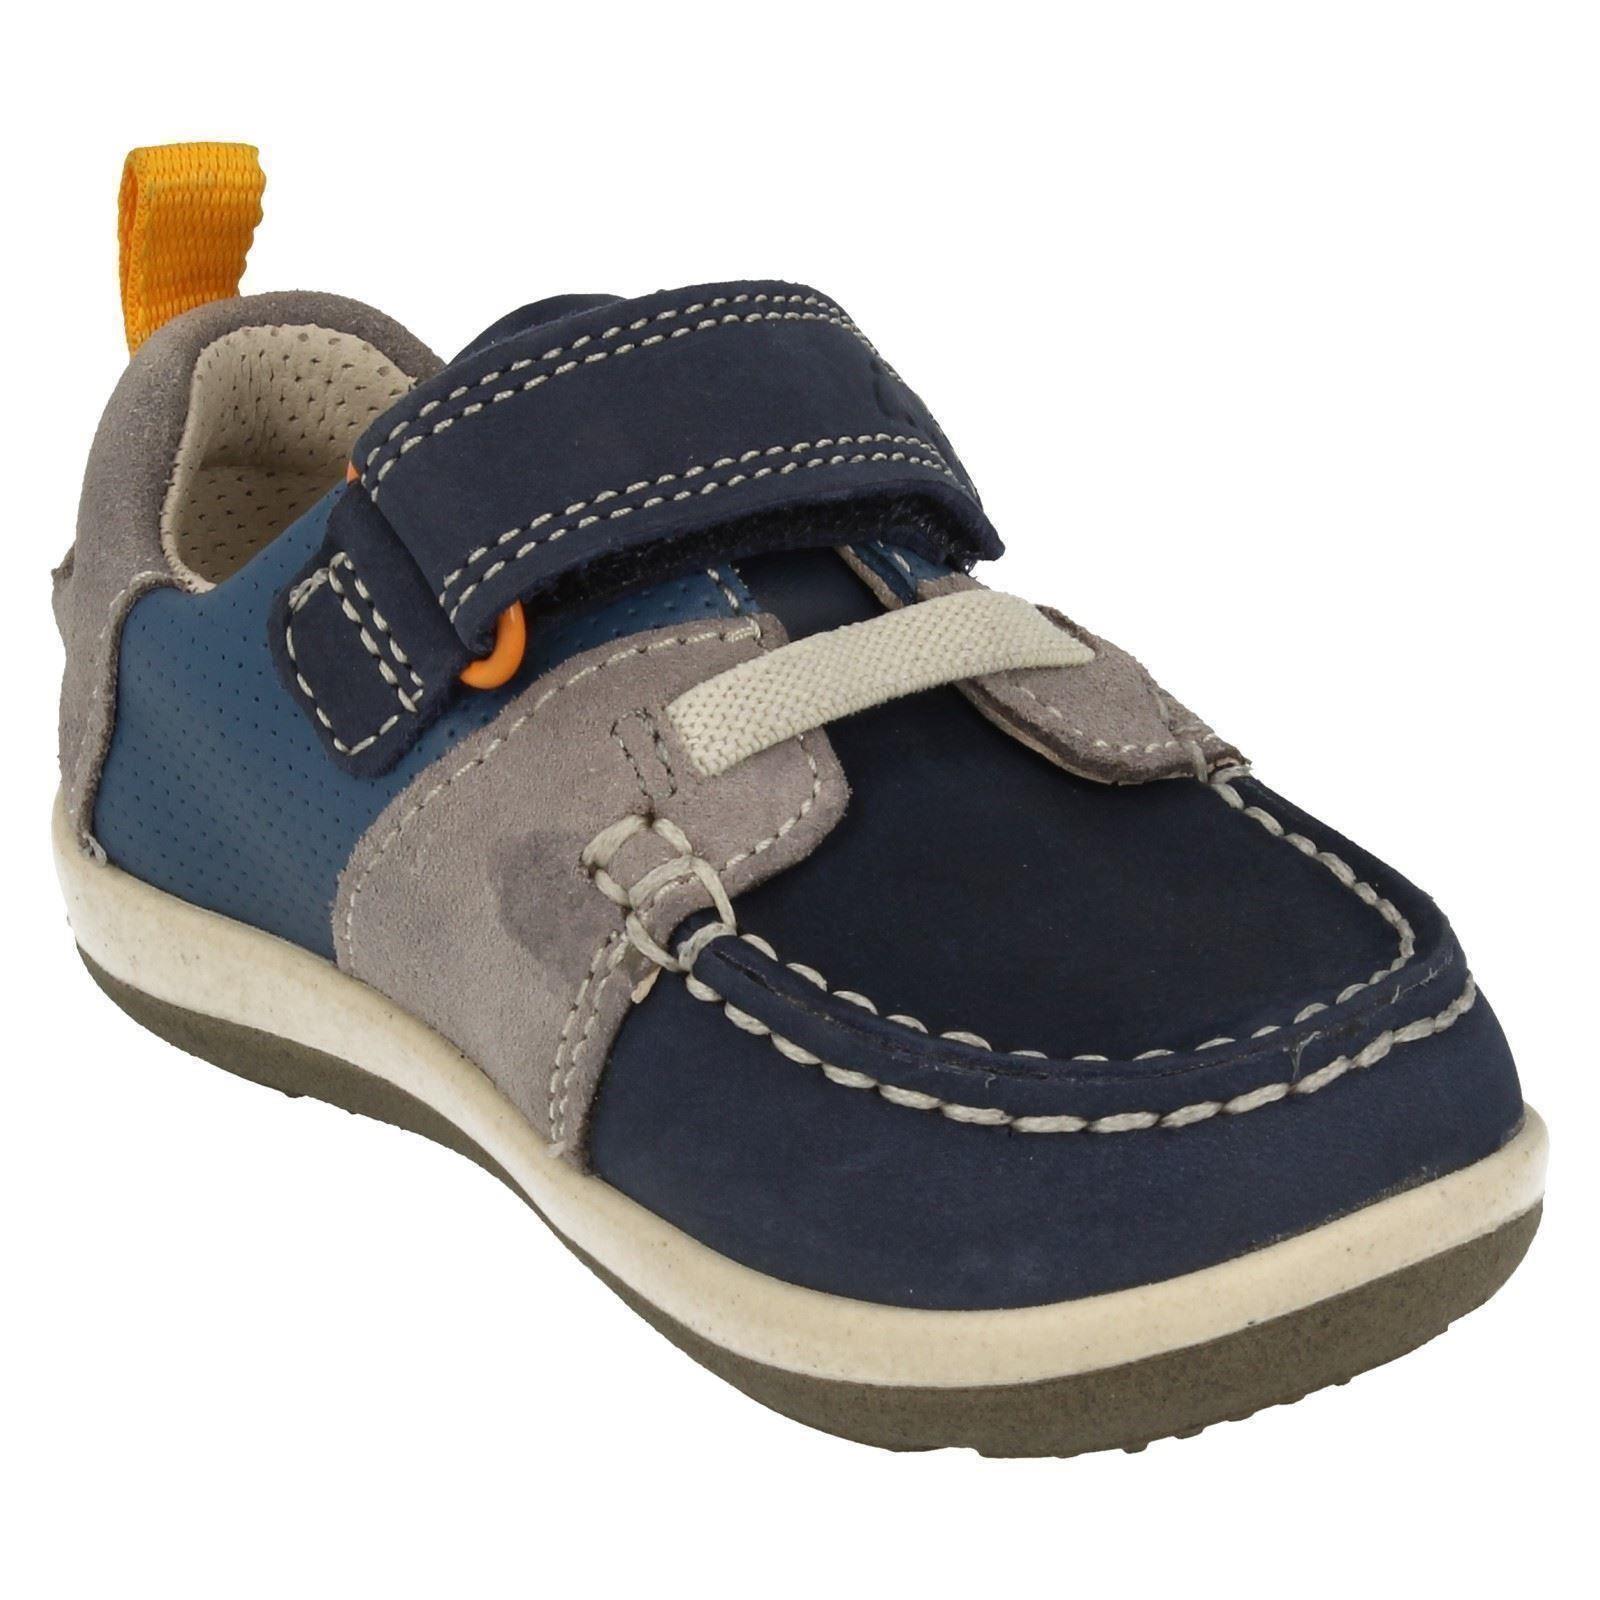 Clarks Softly Boat Fst Boys First Casual Boat Shoes 4 F Blue RuzWVCne